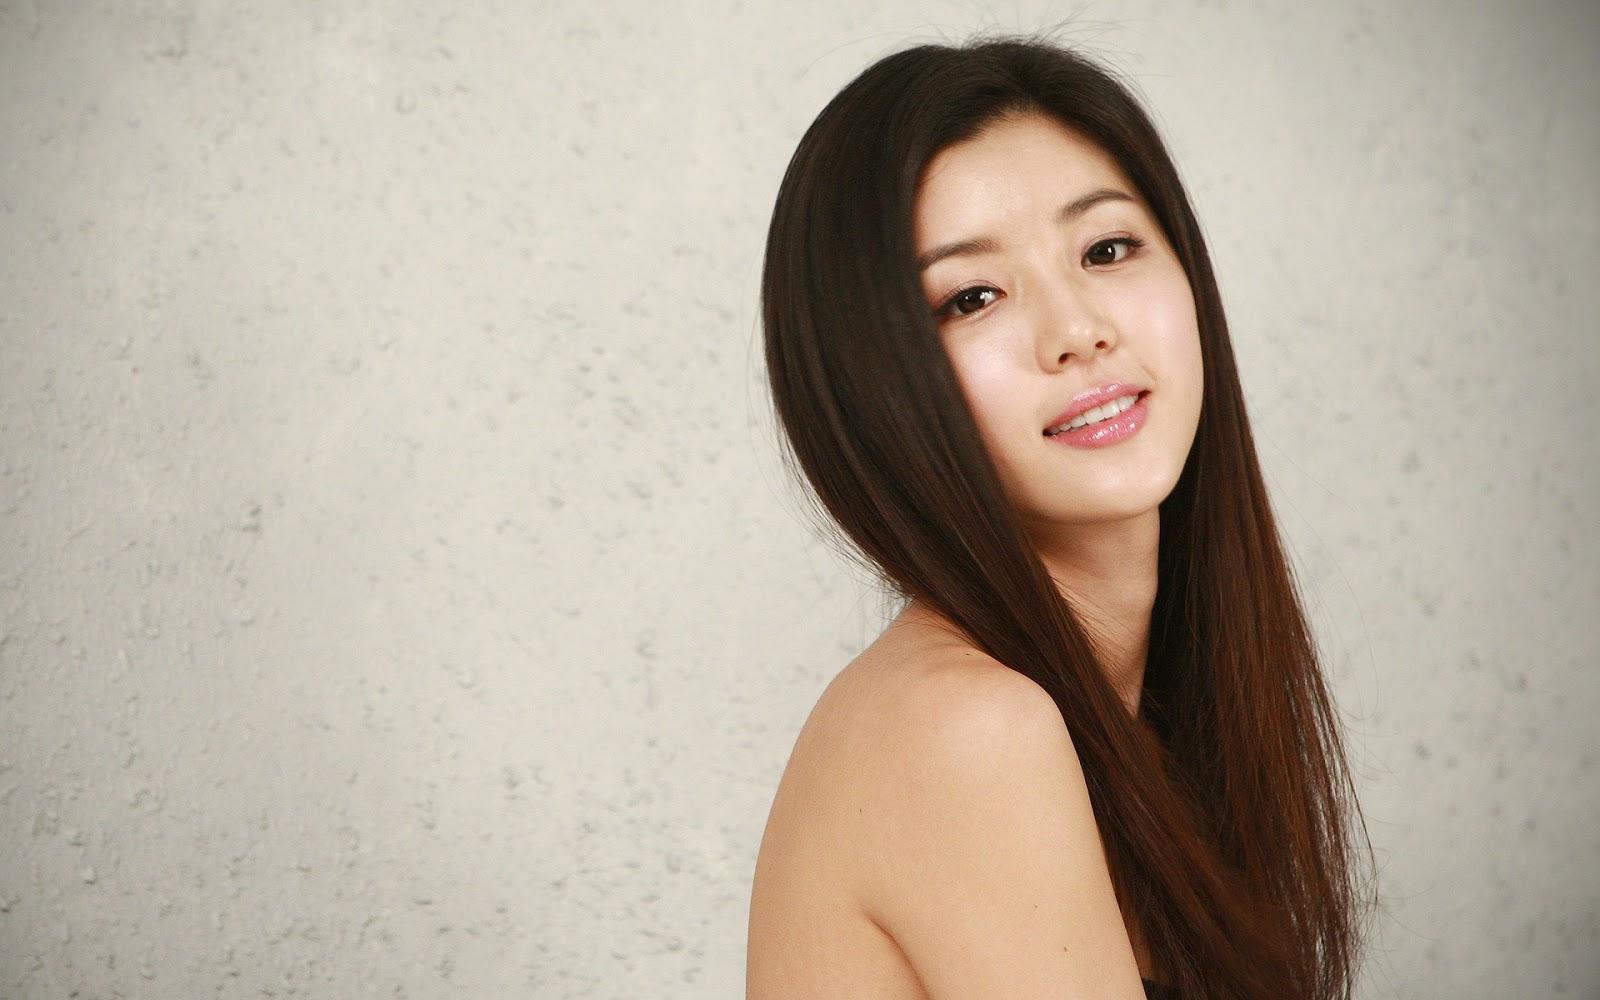 Park Han Byul Image: 8 Months Pregnant Park Han Byul Updates Fans With A Selca